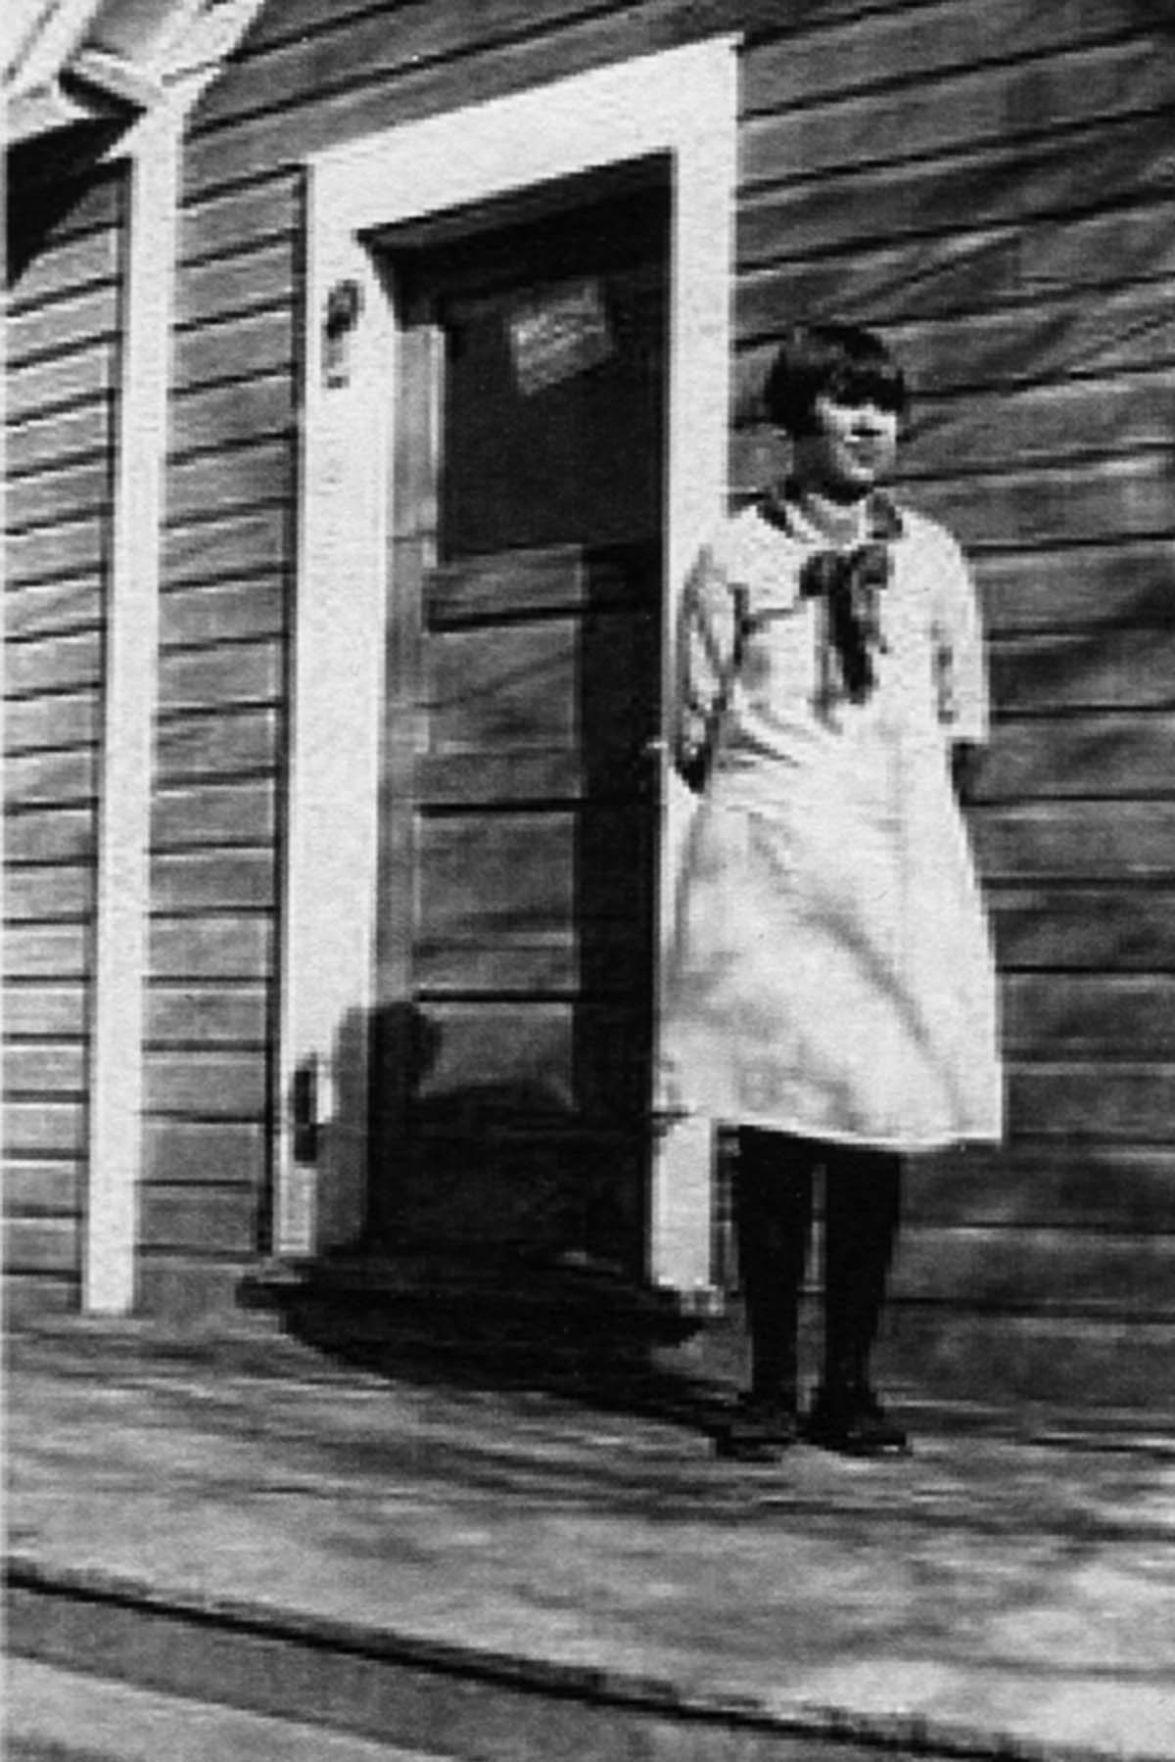 Timeless: Klamath Falls Centenarian remembers her life